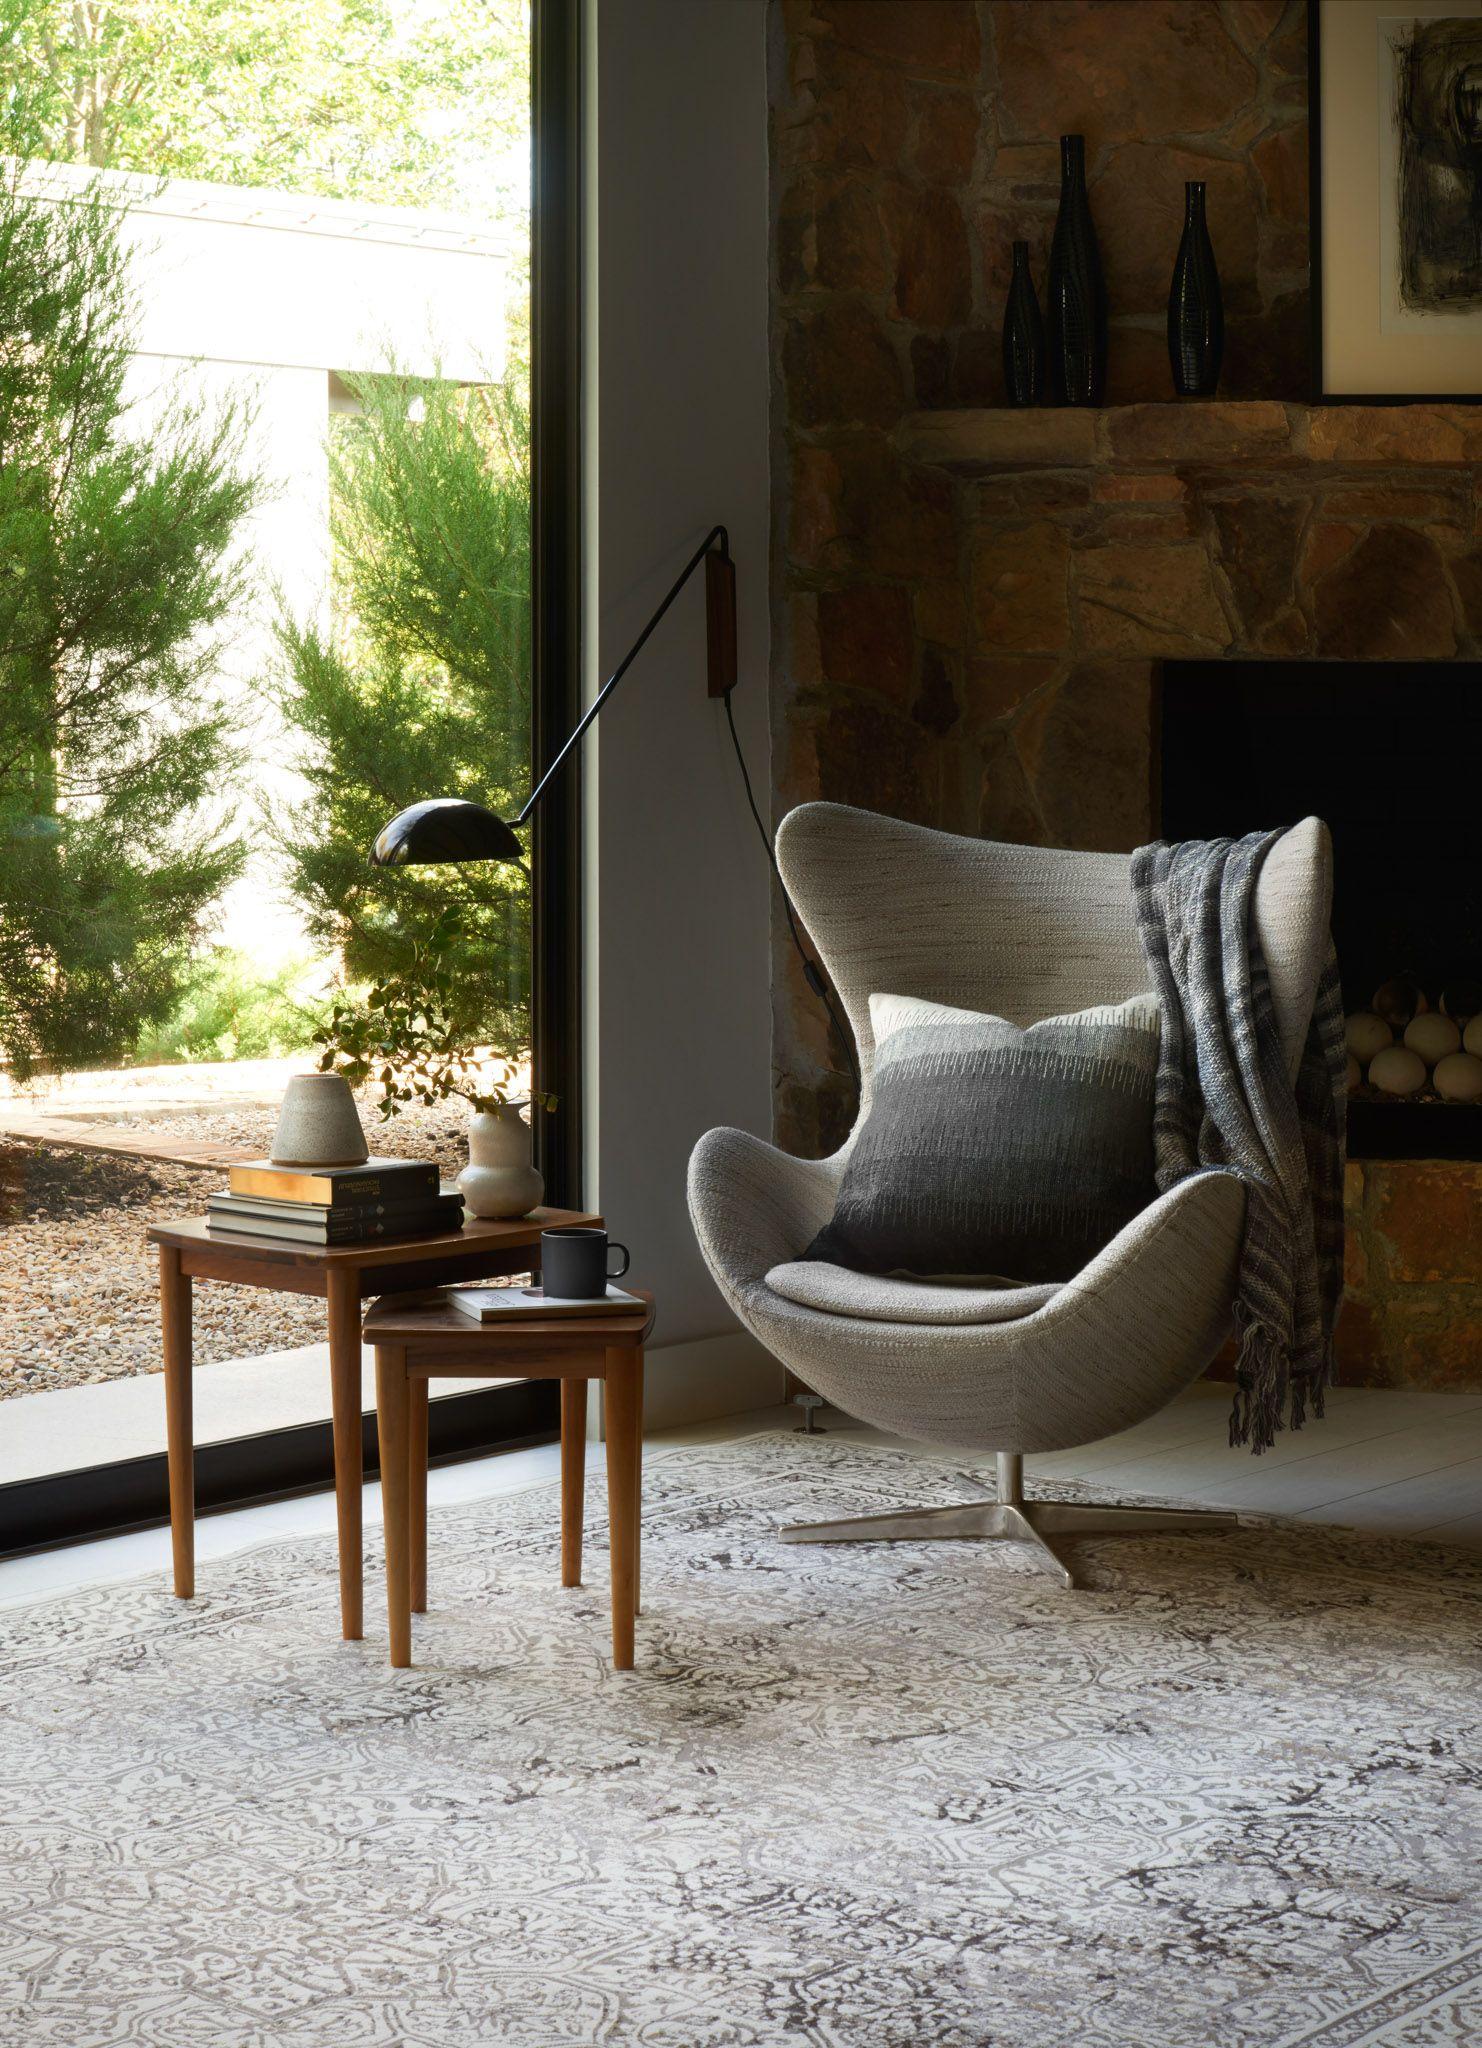 Loloi Kingston KT-06 Ivory /Grey Rug. | Living Room Rug ...